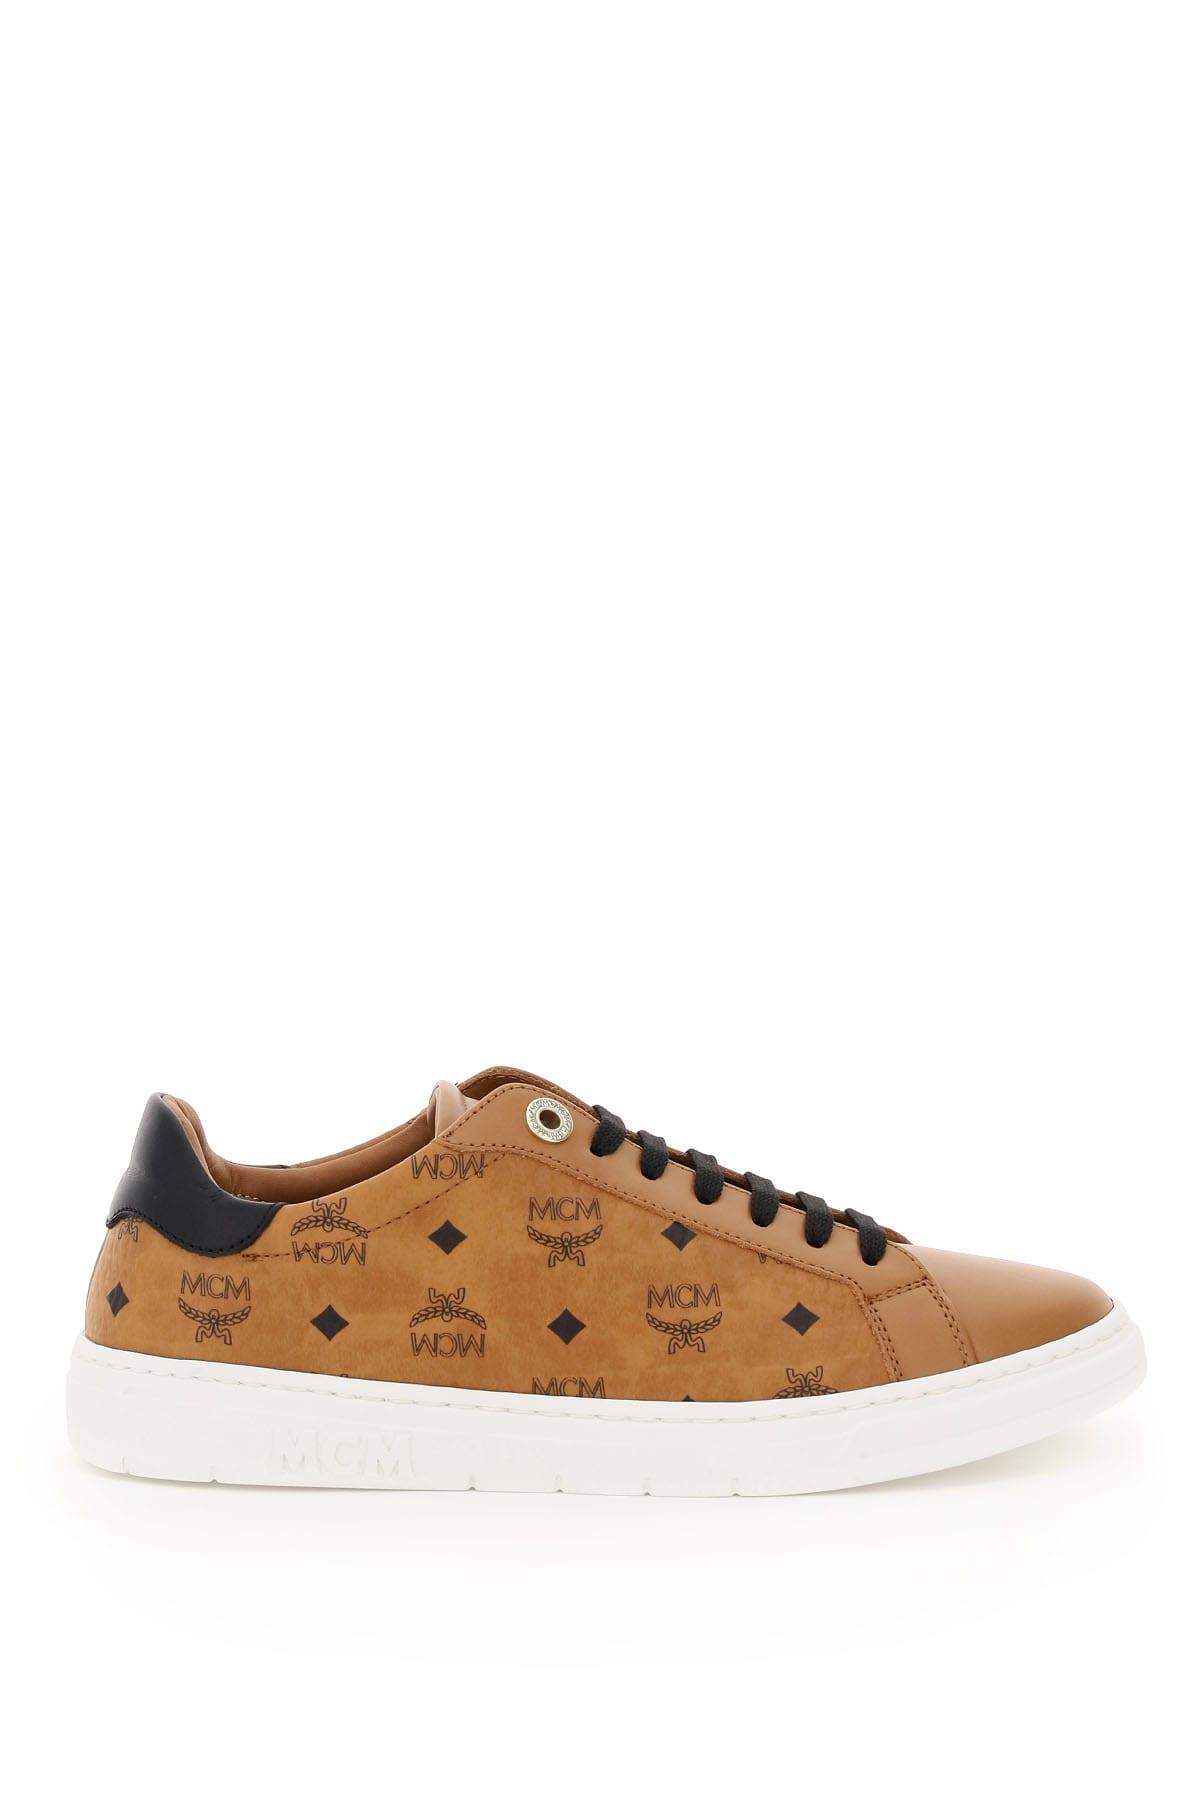 Terrain Visetos Sneakers